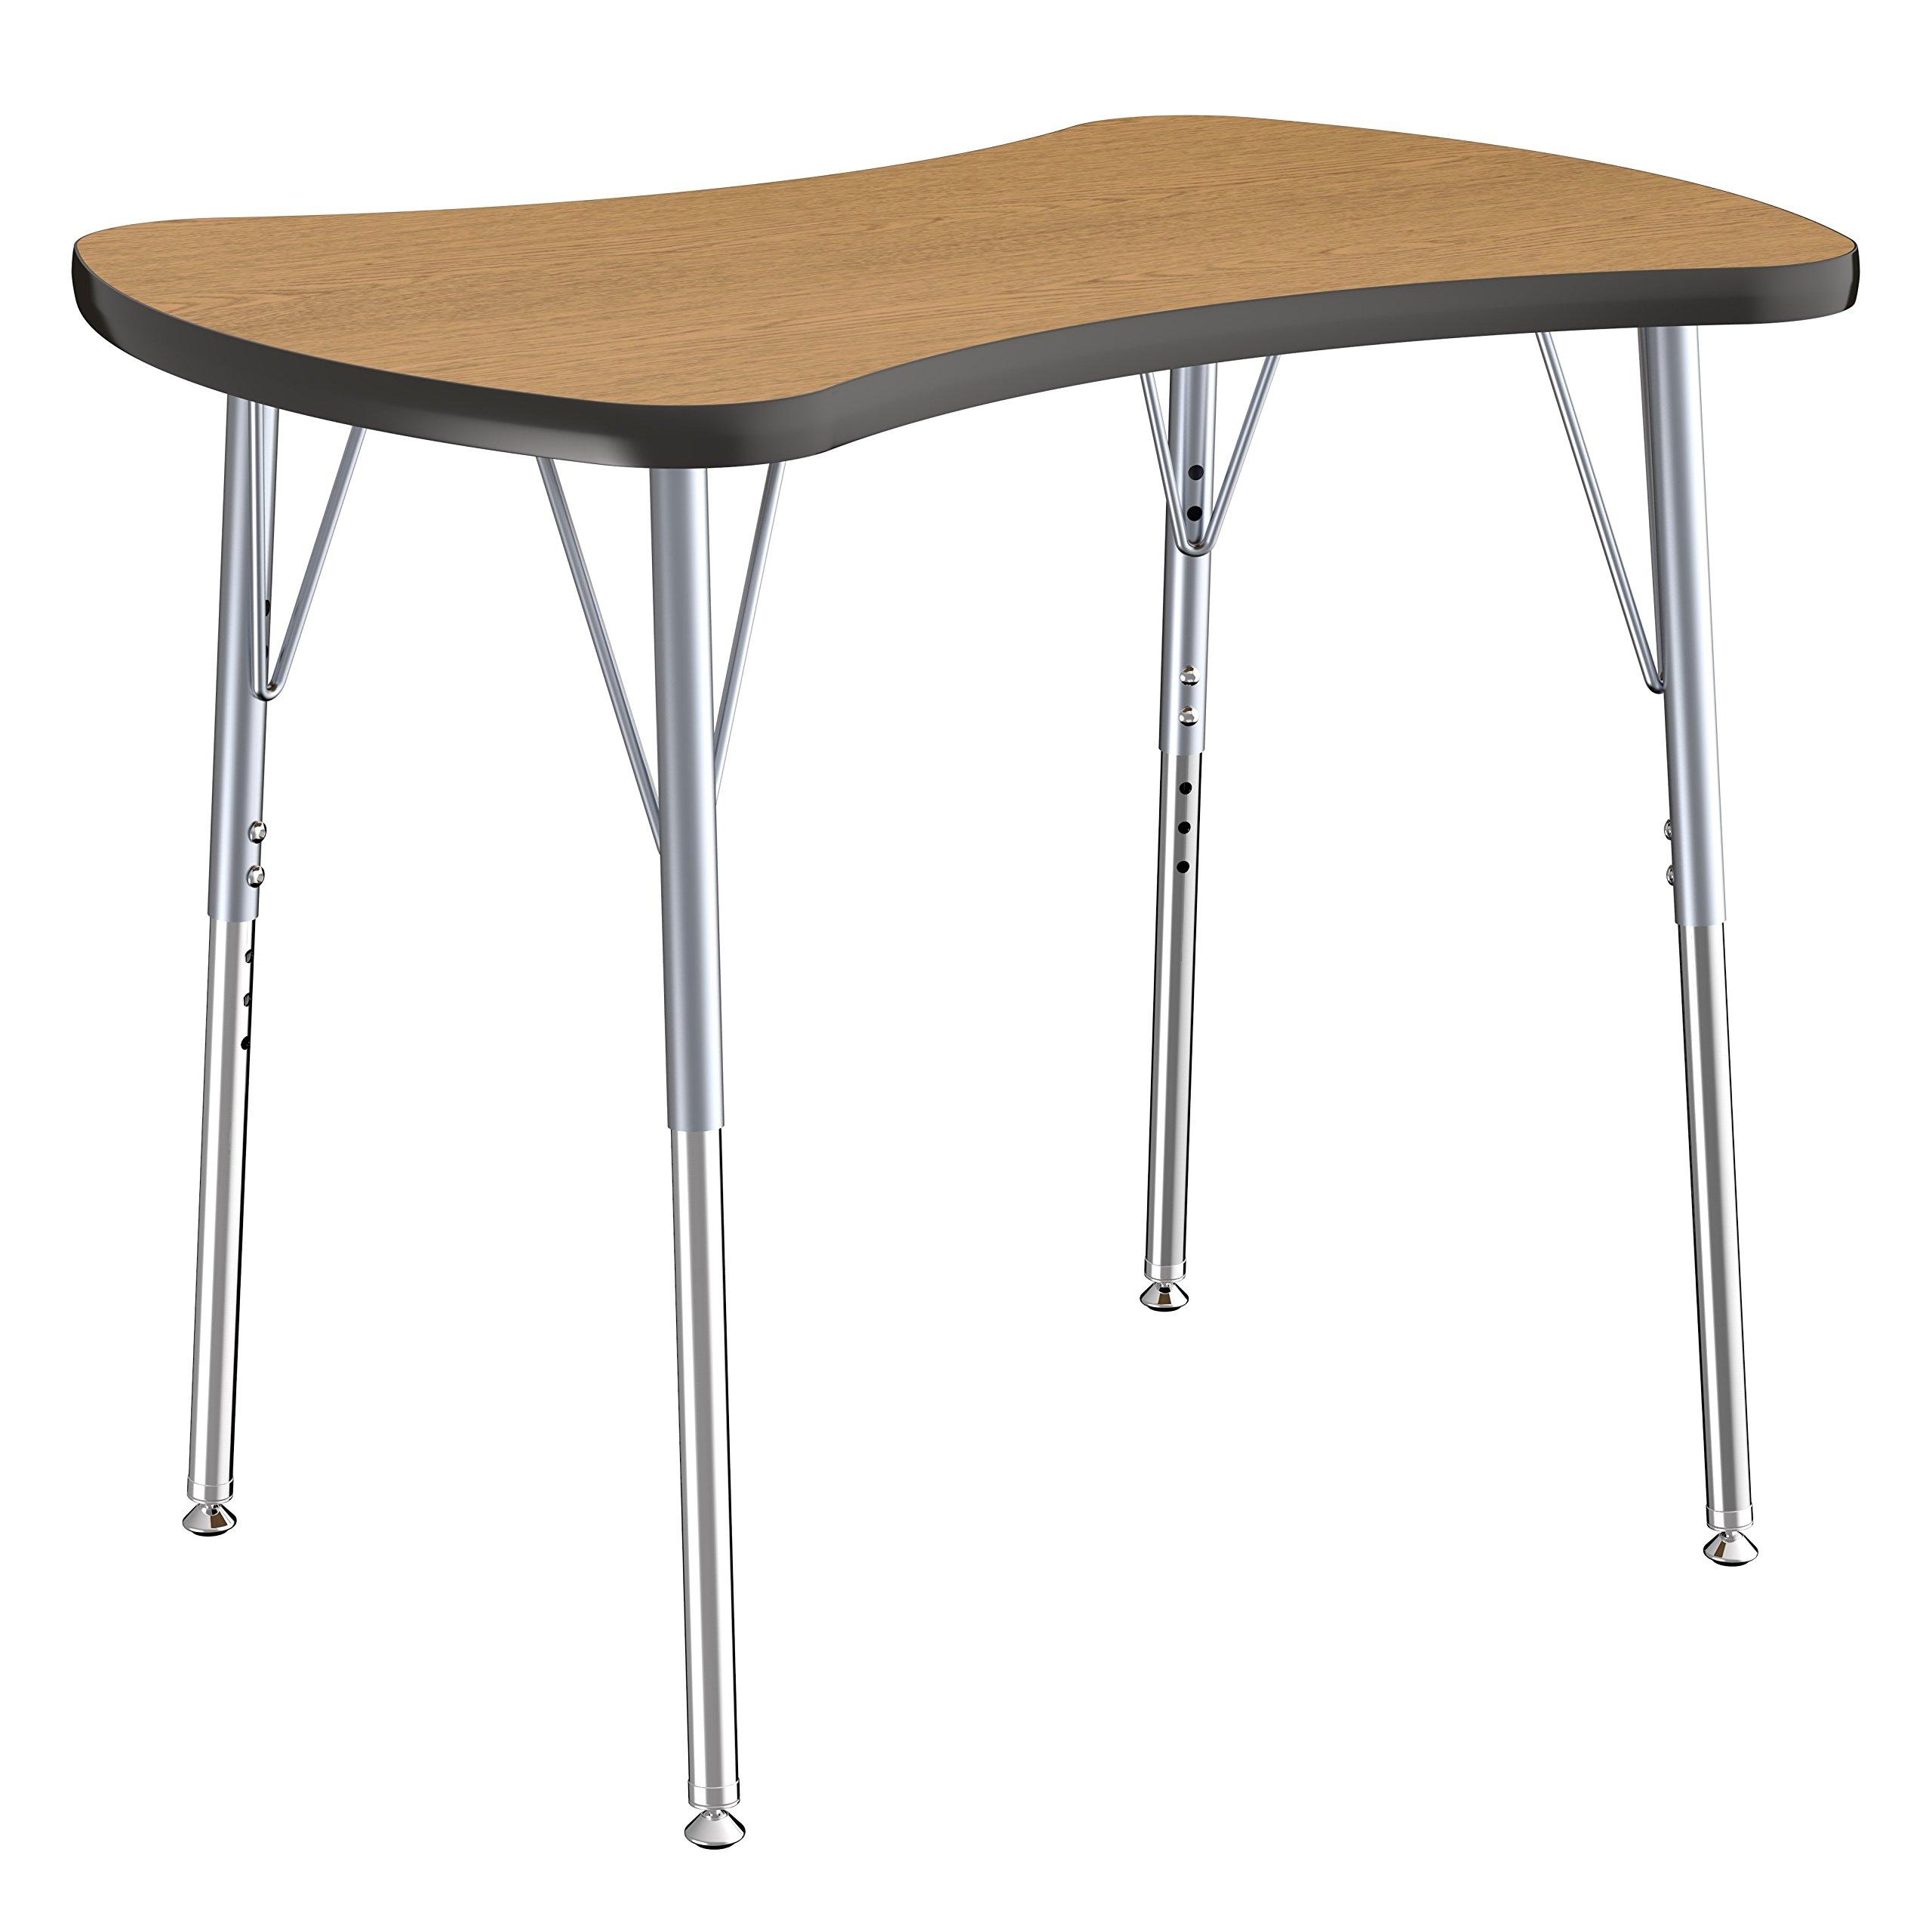 ECR4Kids Contour Bowtie Activity School Table, Standard Legs w/ Swivel Glides, Adjustable Height 19-30 inch (Oak/Black)